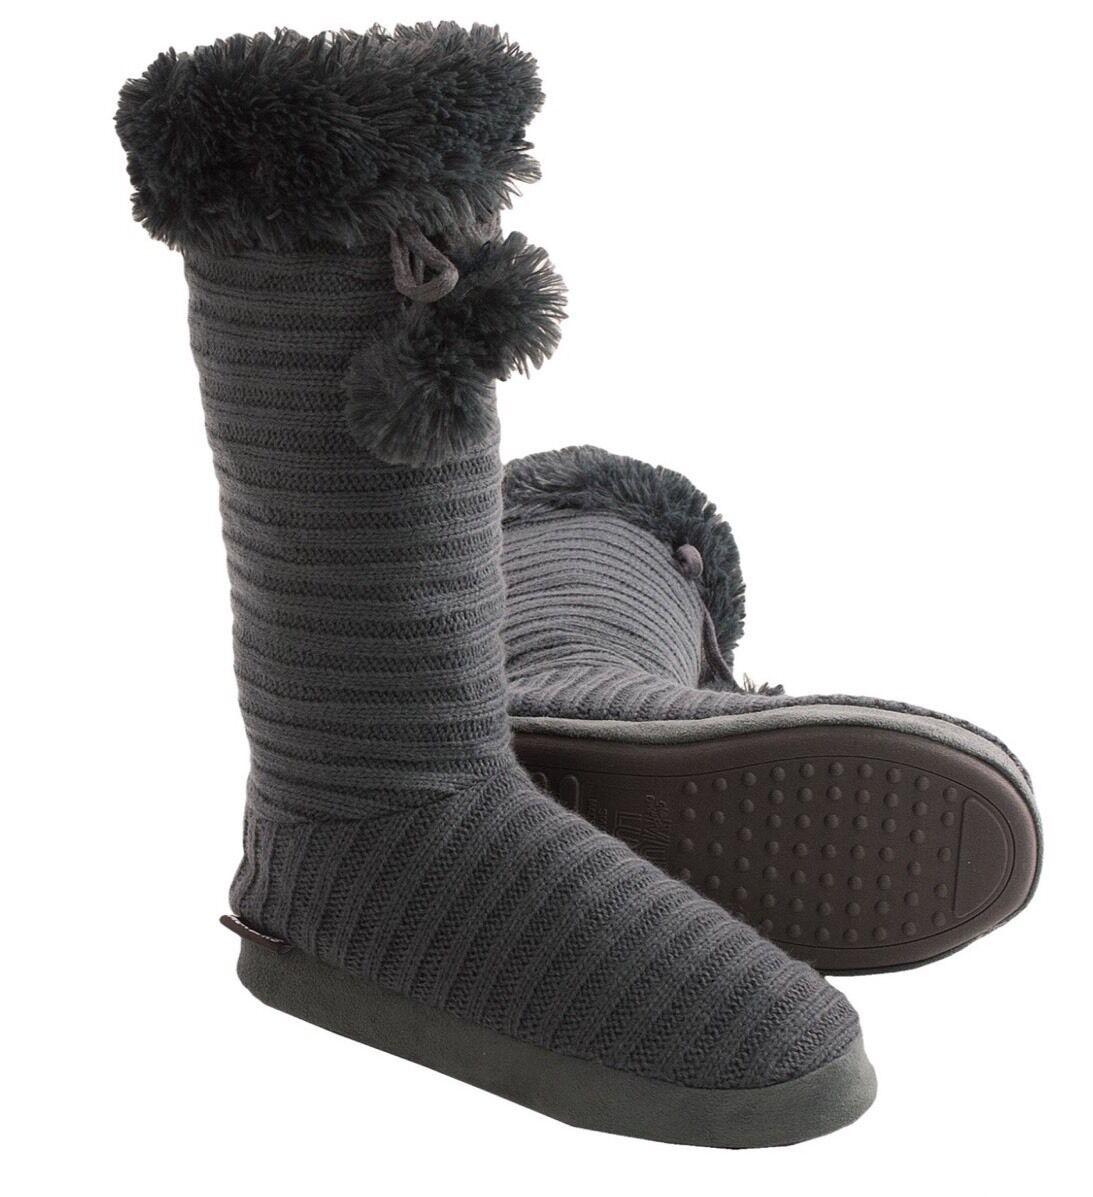 Muk Luks Tall Solid Dark Gray Pom Pom Boot Slipper Large 9 10 M New